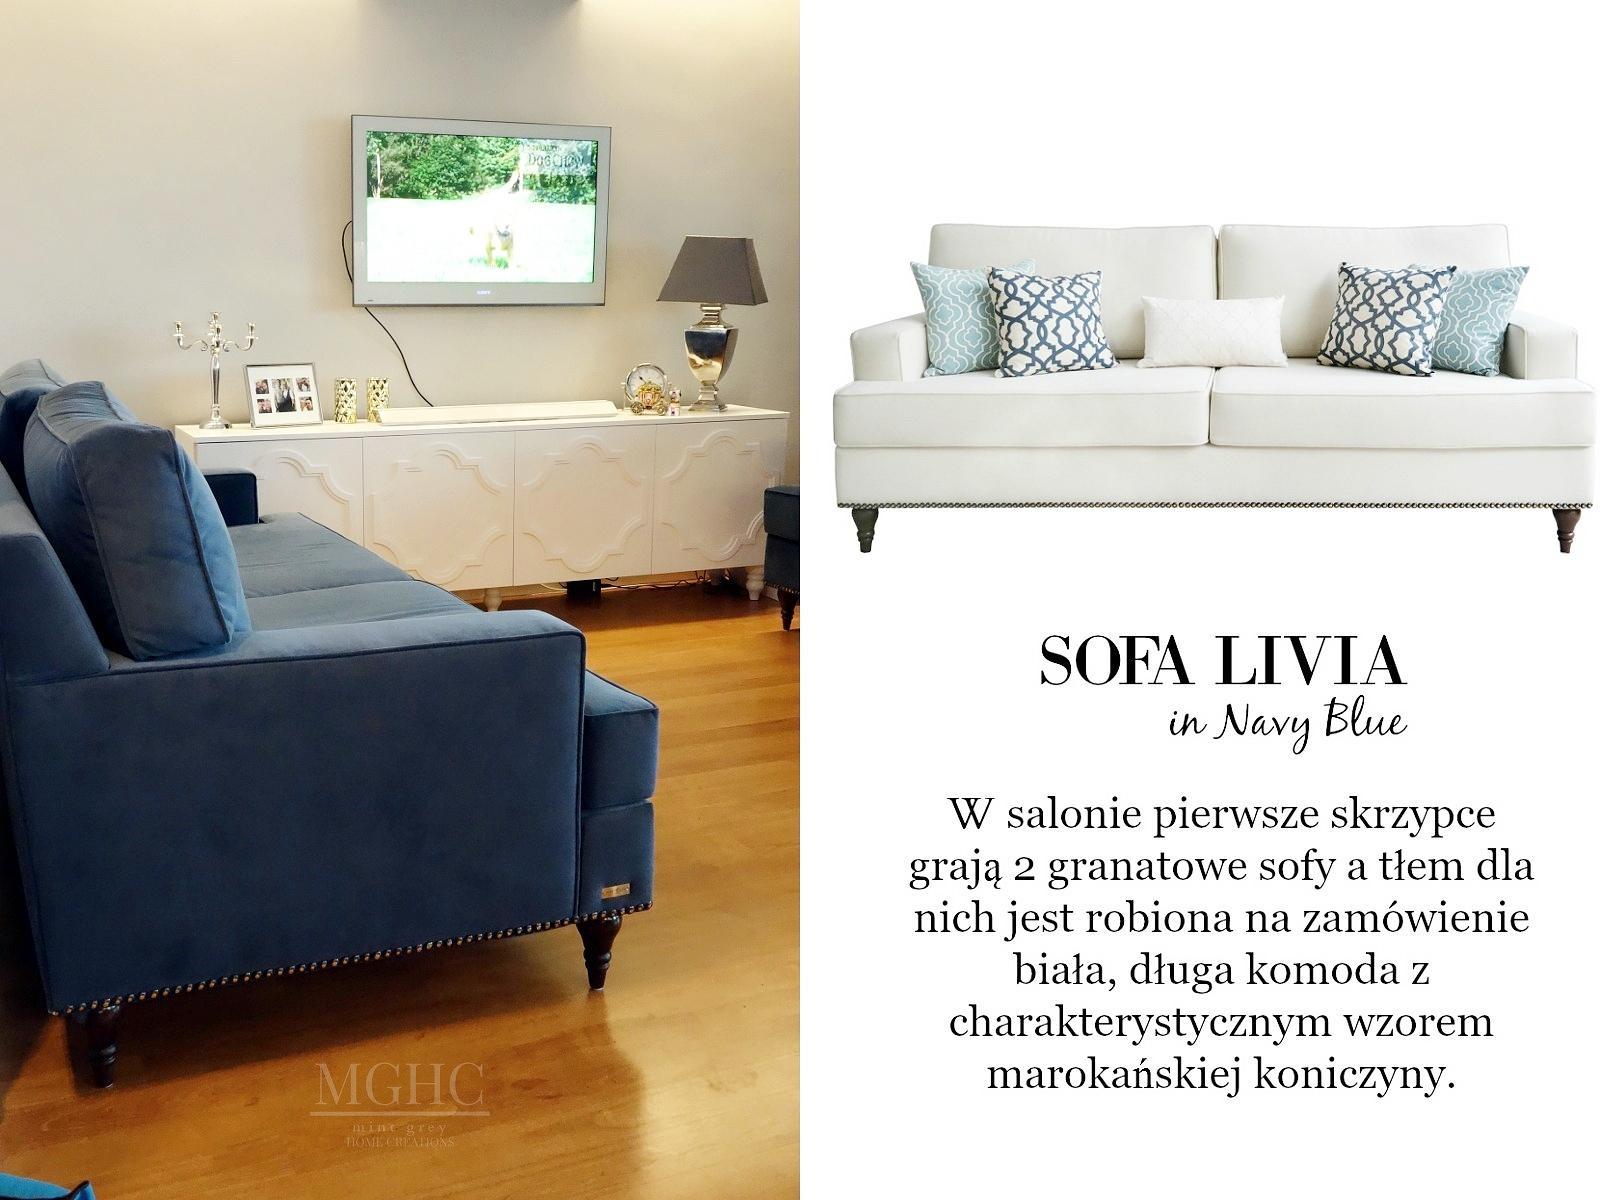 Sofa-LIVIA-1a-mini1c_thumb[1].jpg